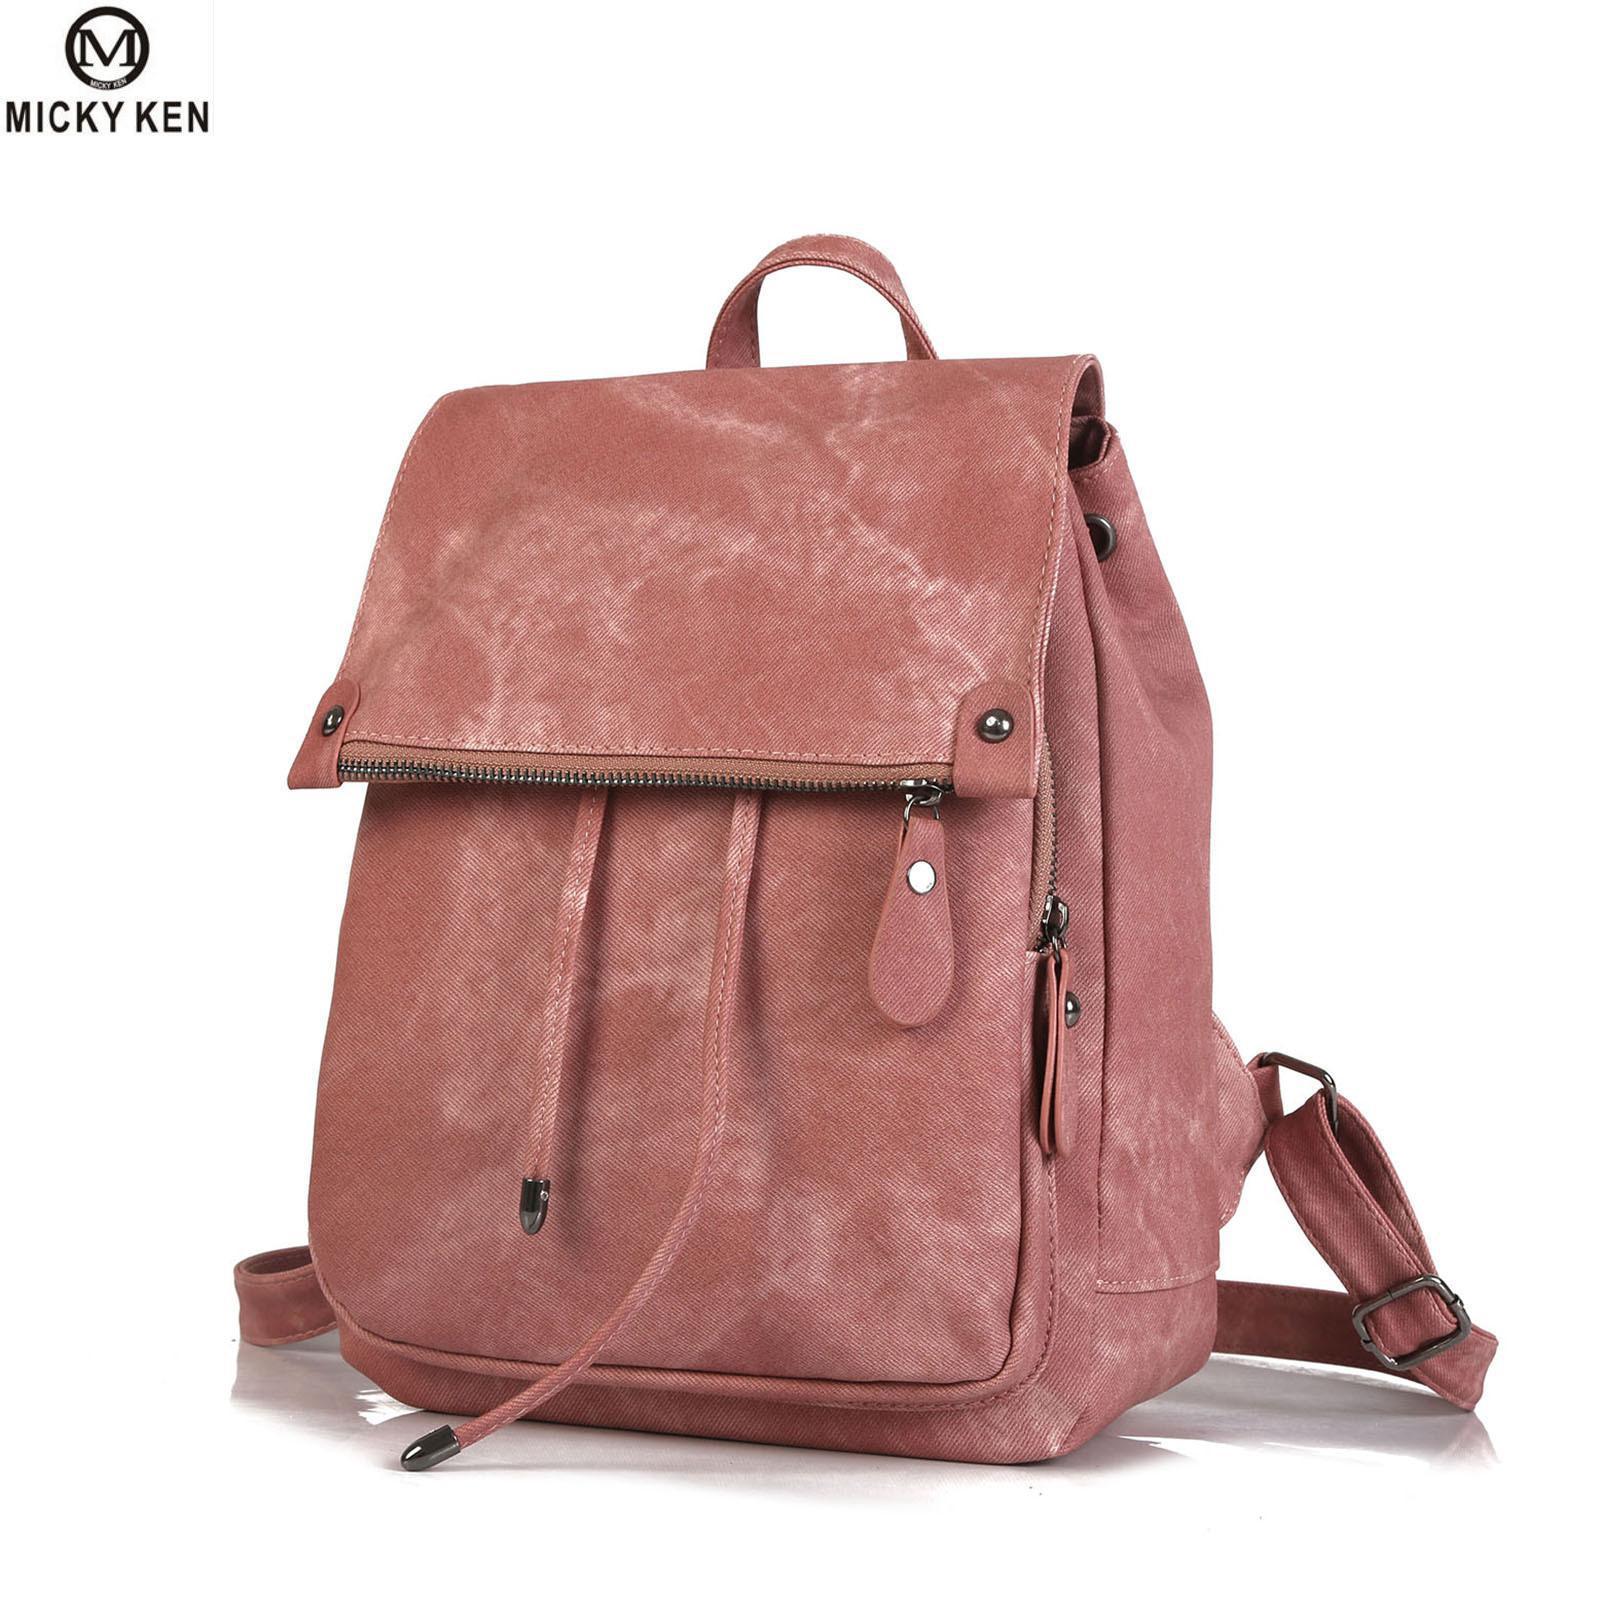 on Simple Backpack Women PU Leather Backpack For Teenage Girls School Bags on Vintage Black Shoulder Bag